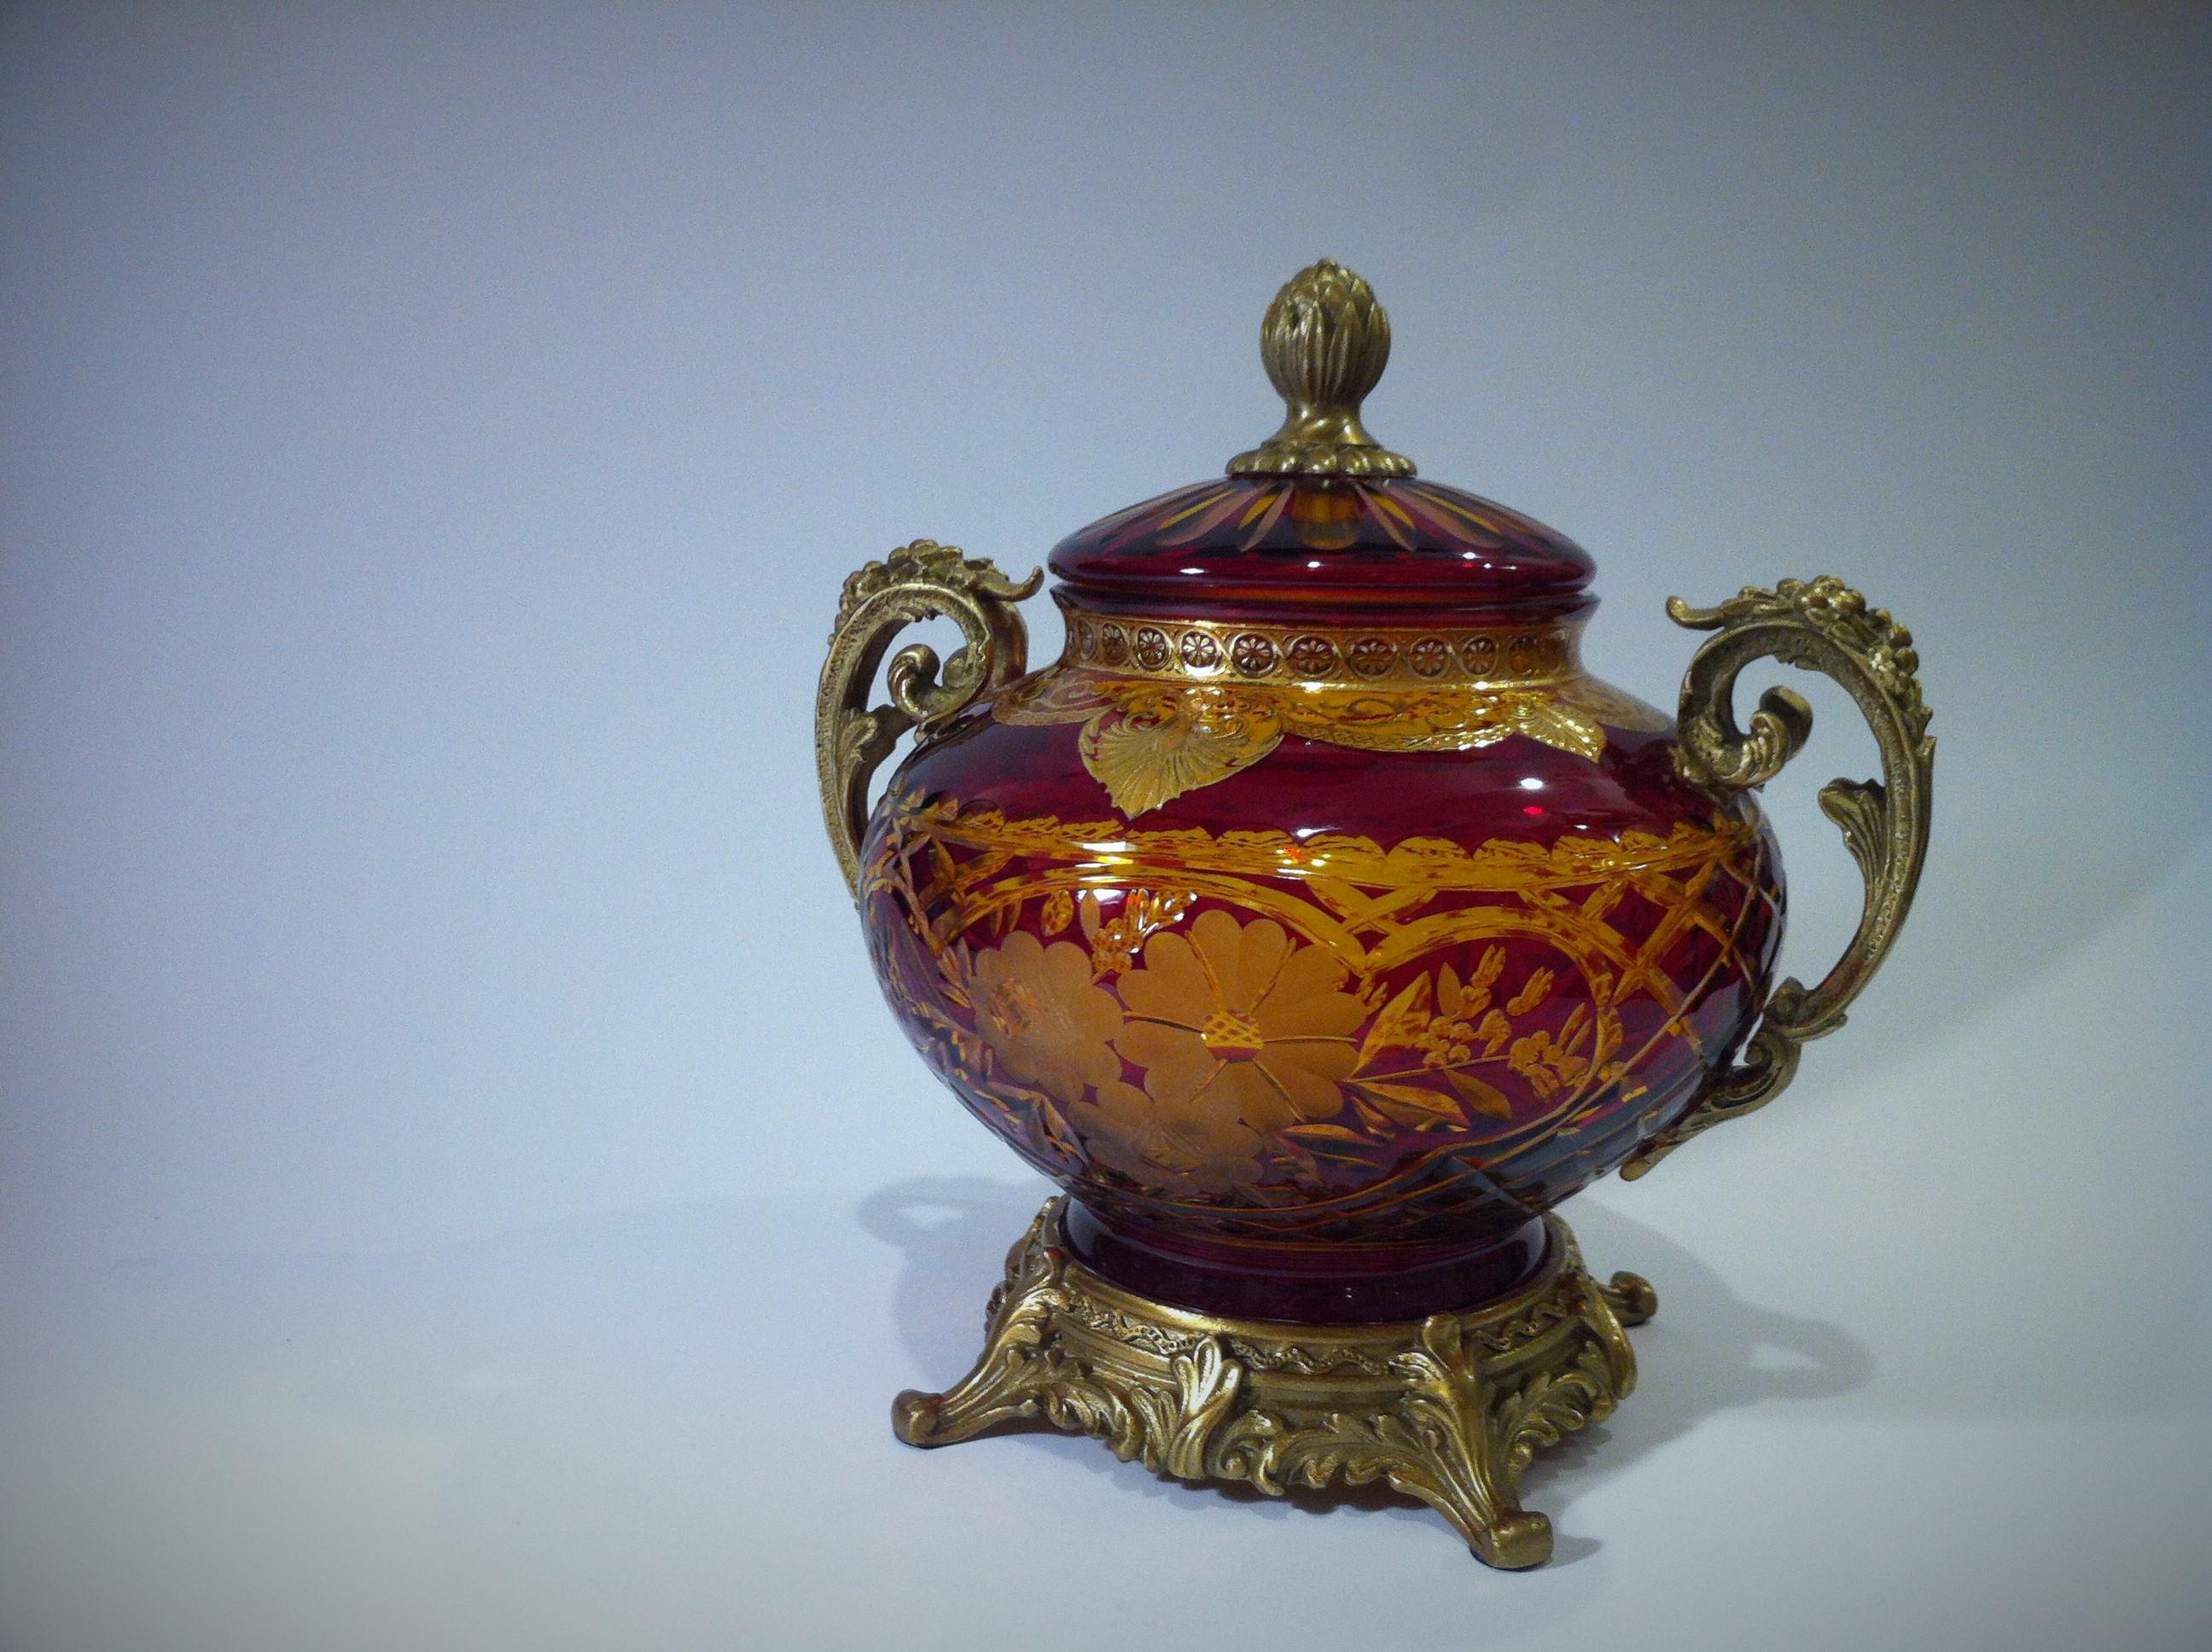 Antique Antique Ruby Glass Candy Box | Antik Spalato Shop